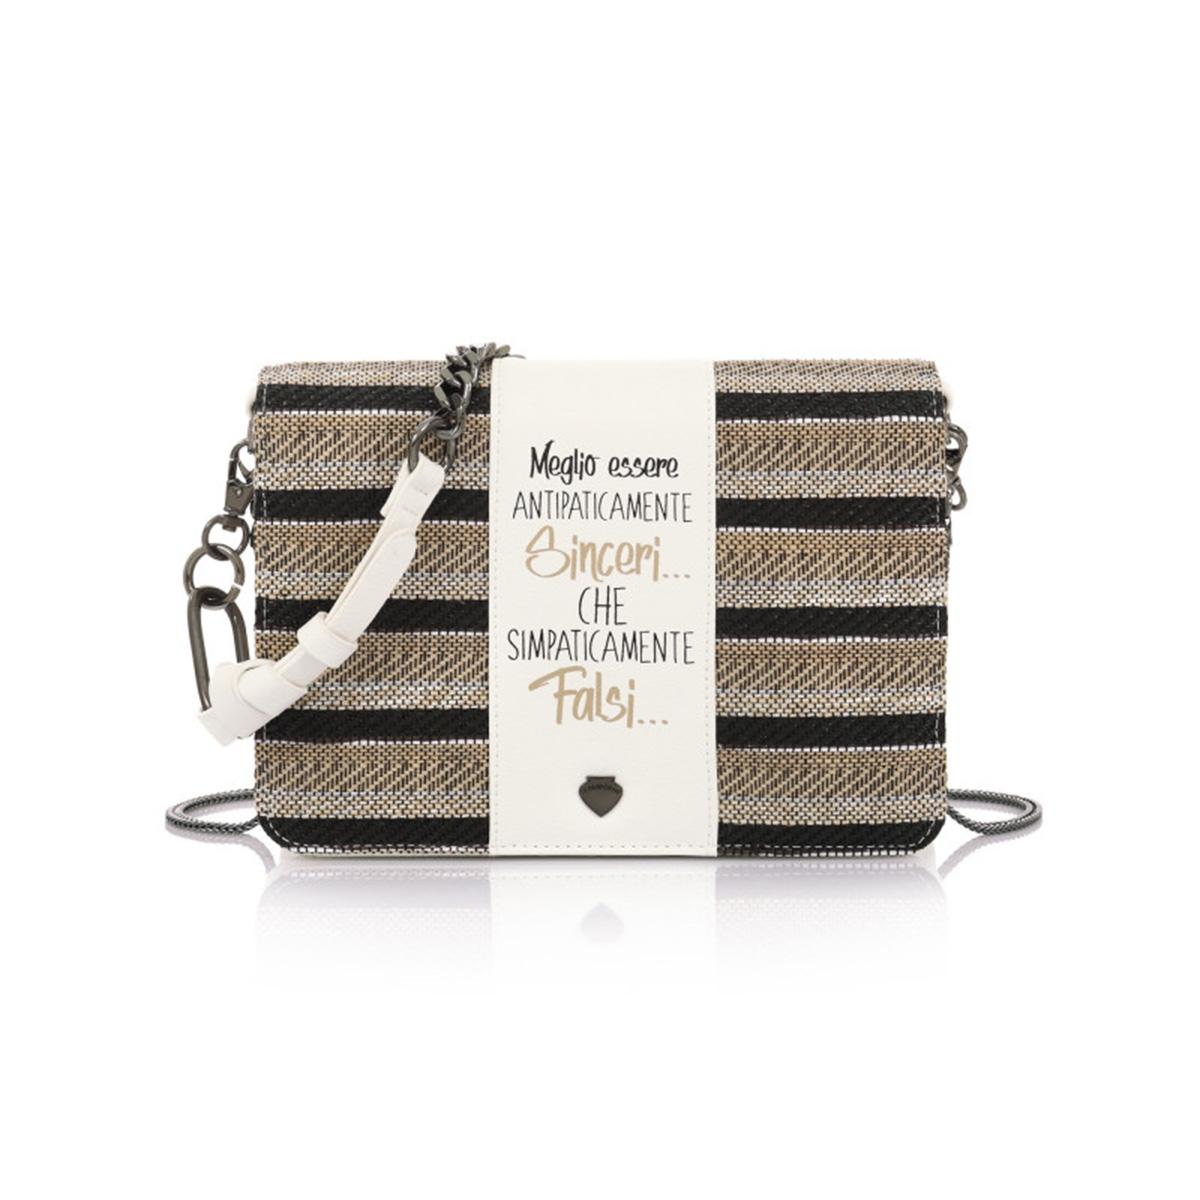 5d72a86669 Τσάντα Ώμου-Χιαστί Με Αλυσίδα   Πλεκτό Καπάκι Le Pandorine Pochette Sinceri  DBH02333 Λευκή